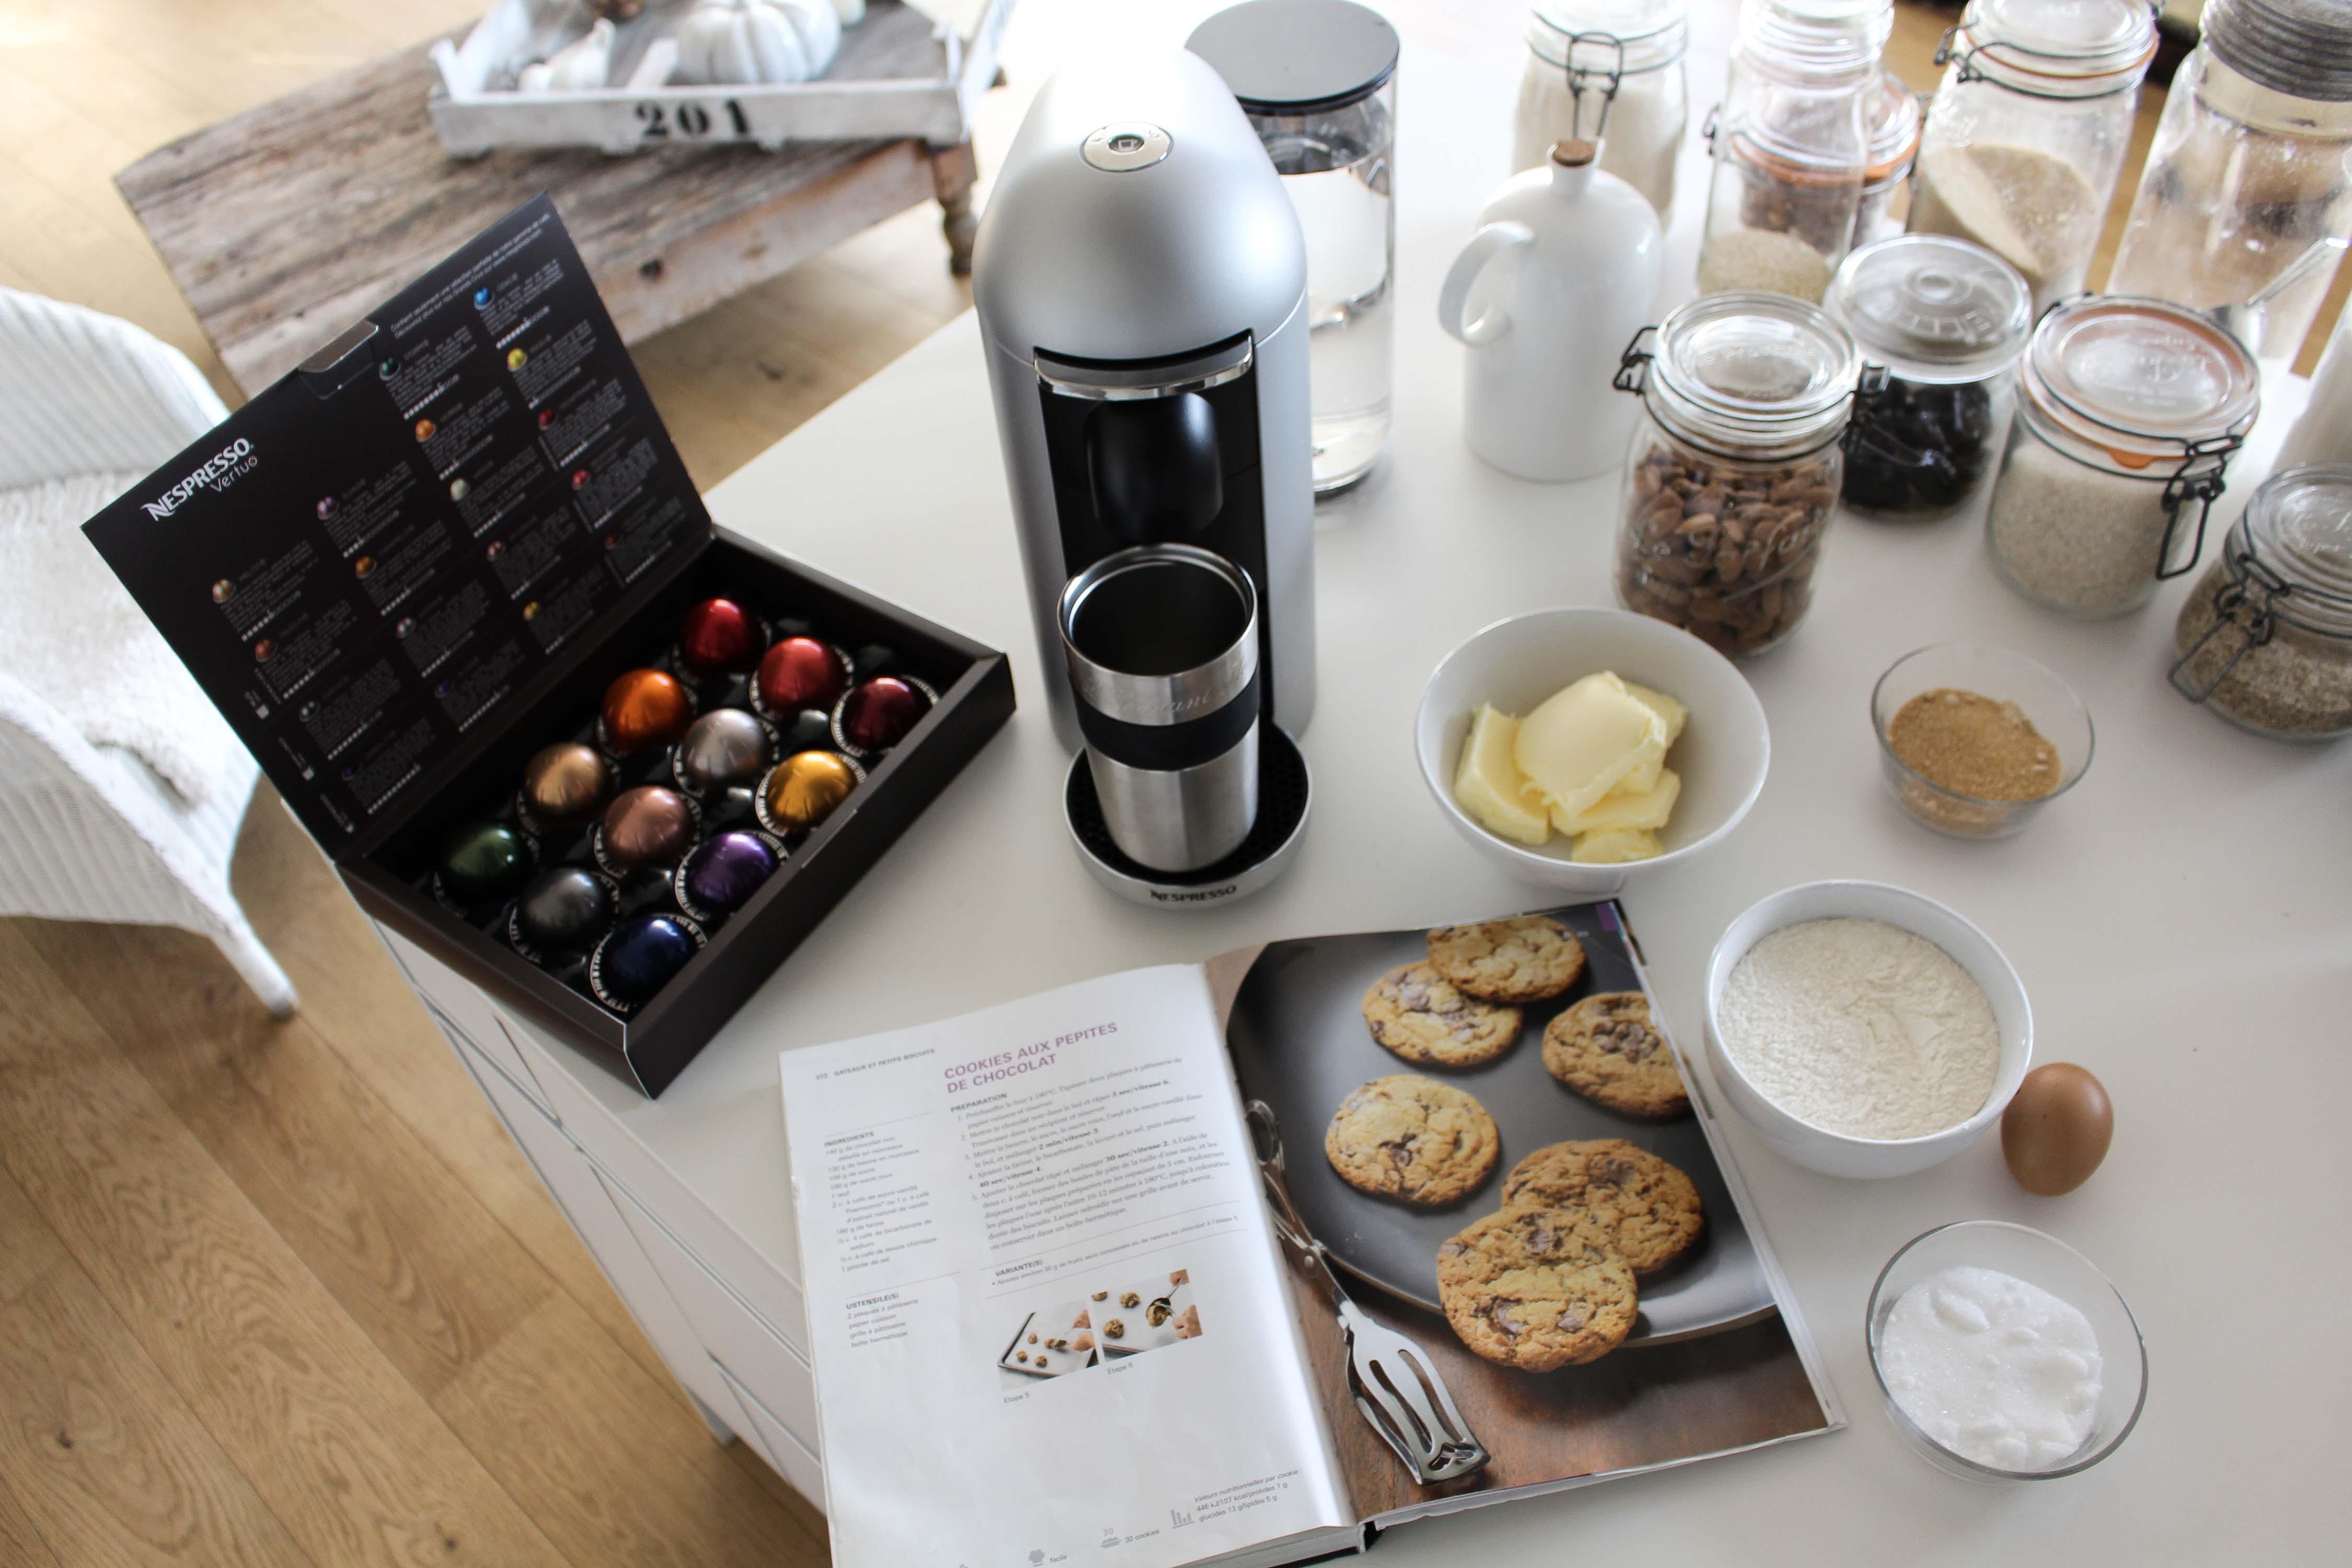 nespresso-recette-linstantflo-5-sur-16